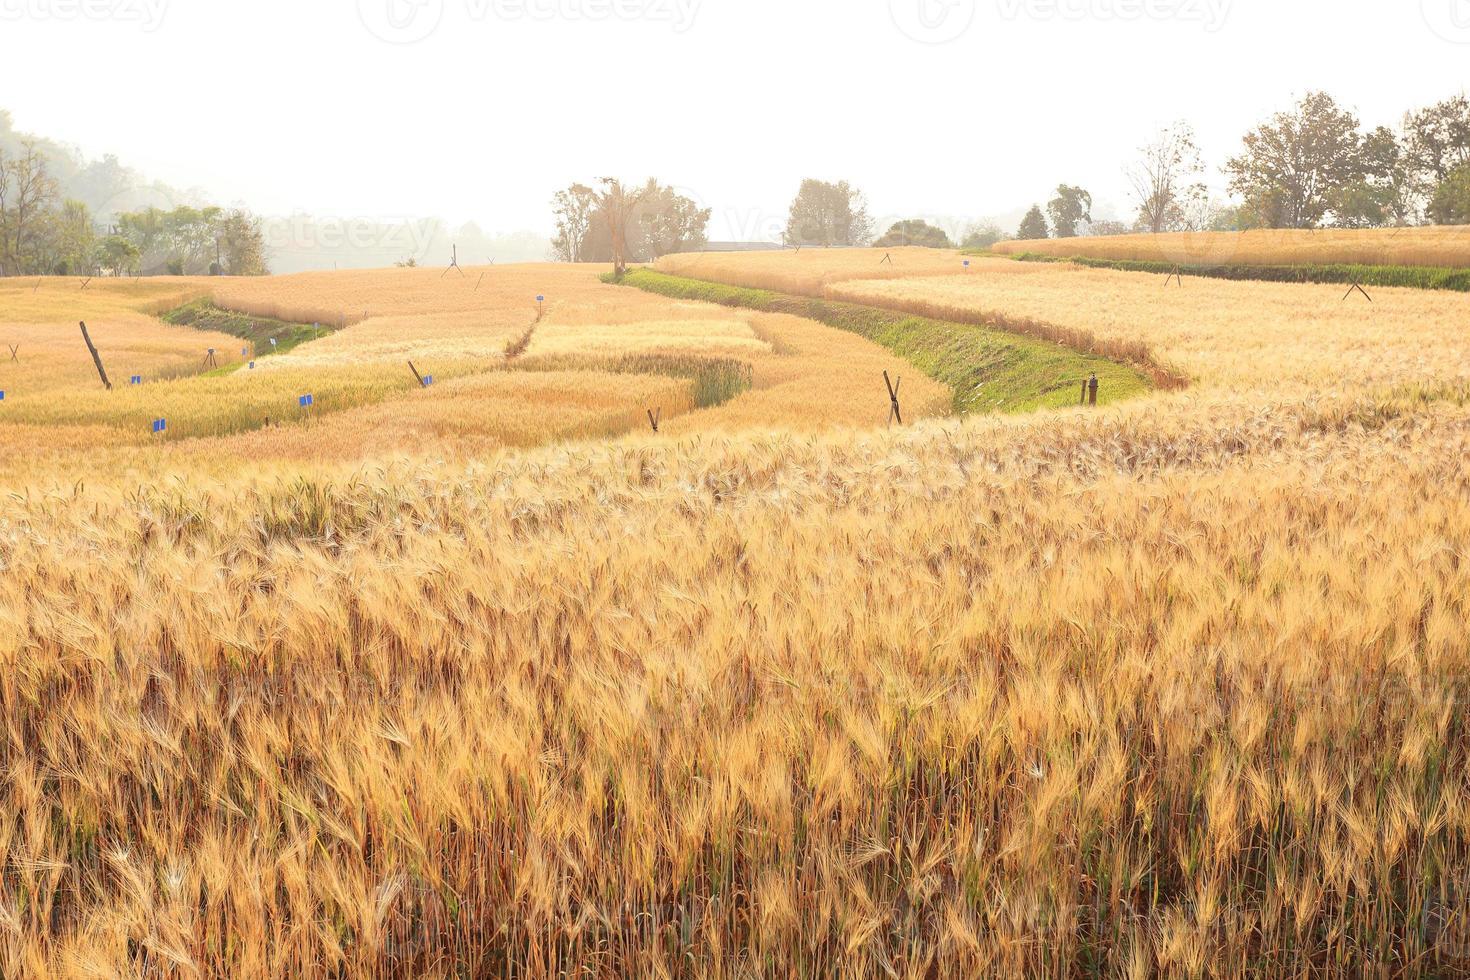 campo de cevada da agricultura cena rural foto